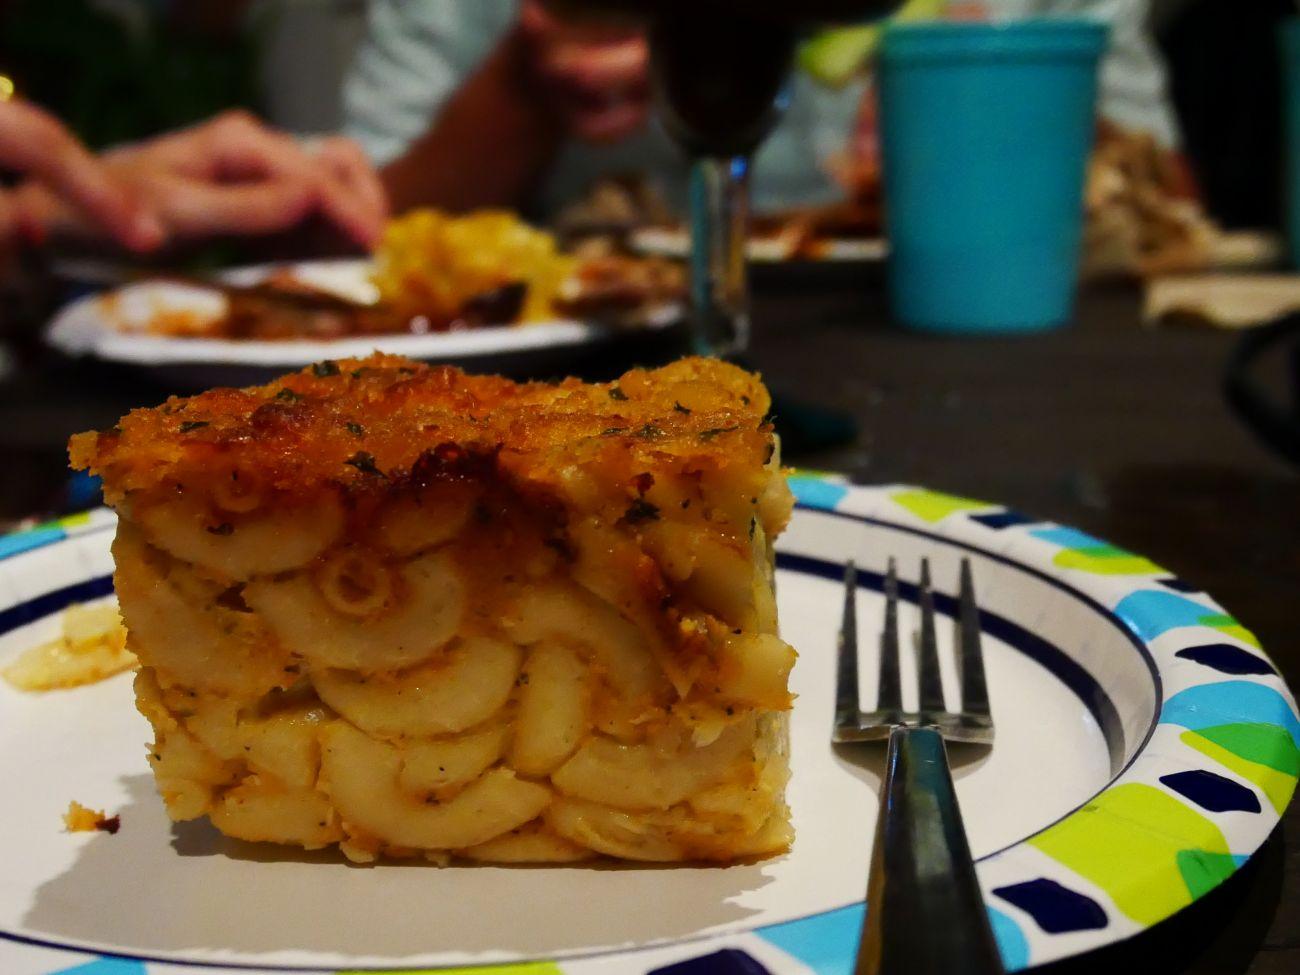 Mac n' cheese pie